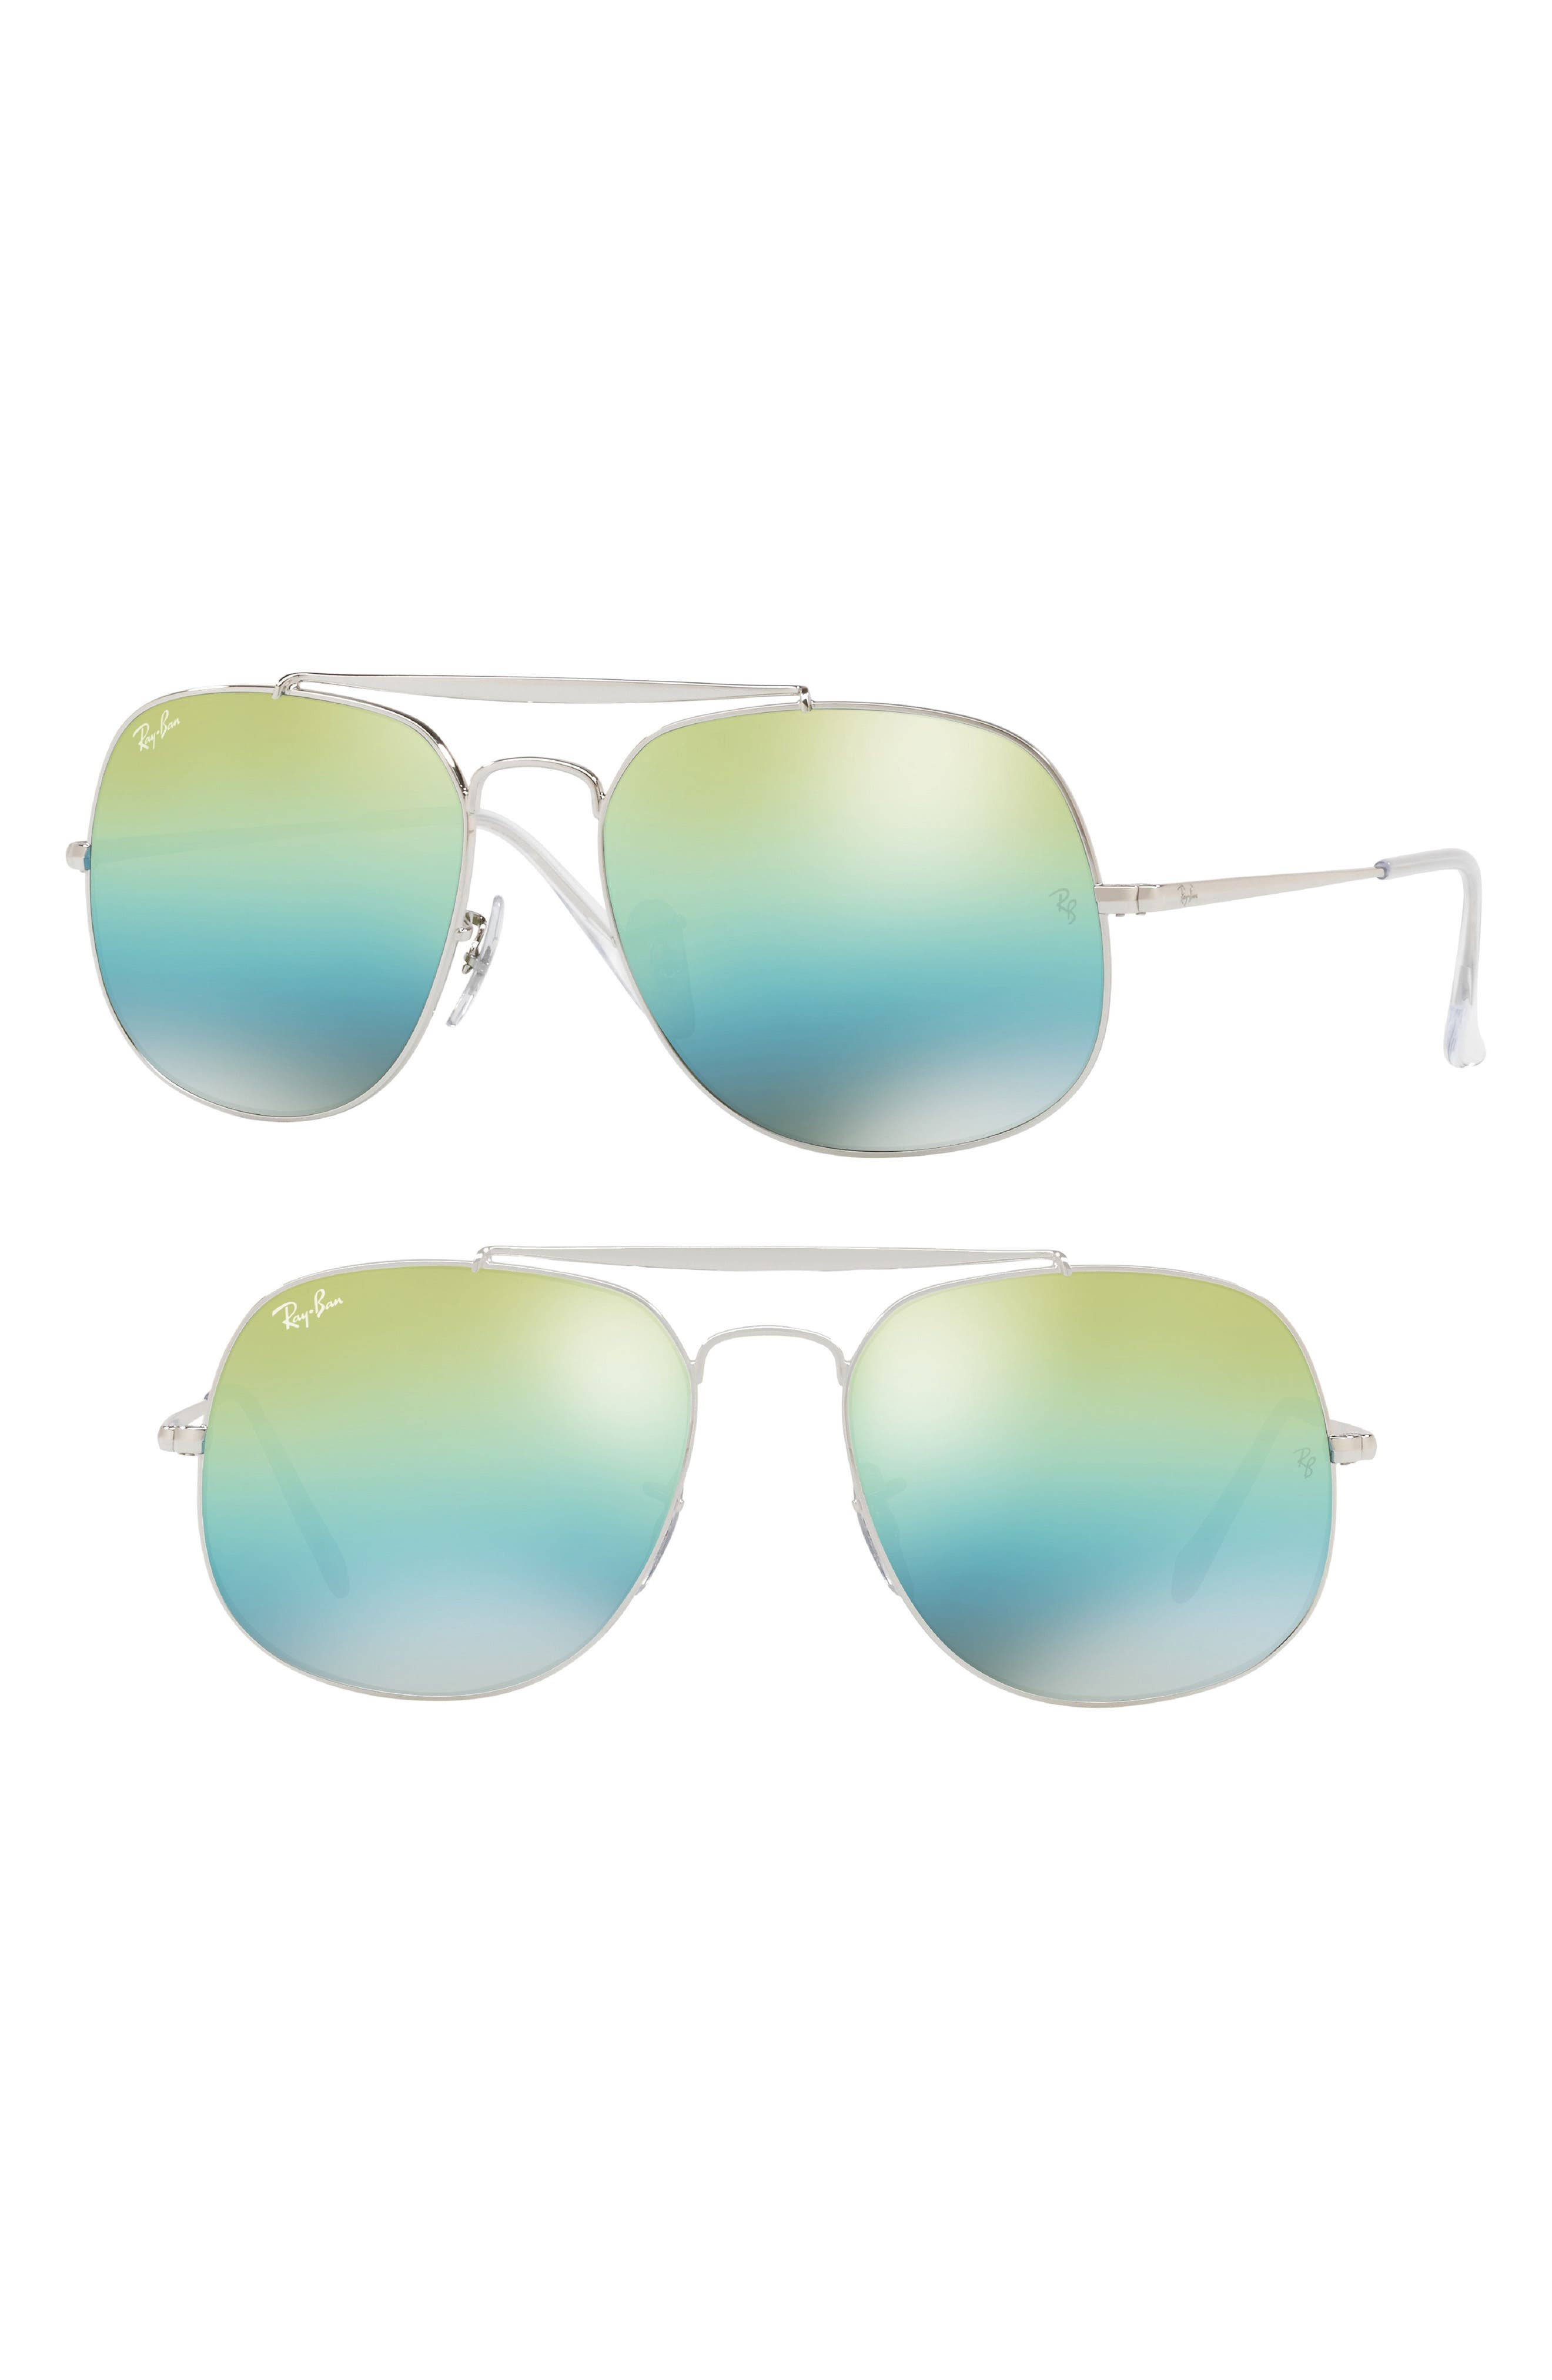 57mm Aviator Sunglasses,                             Main thumbnail 1, color,                             400